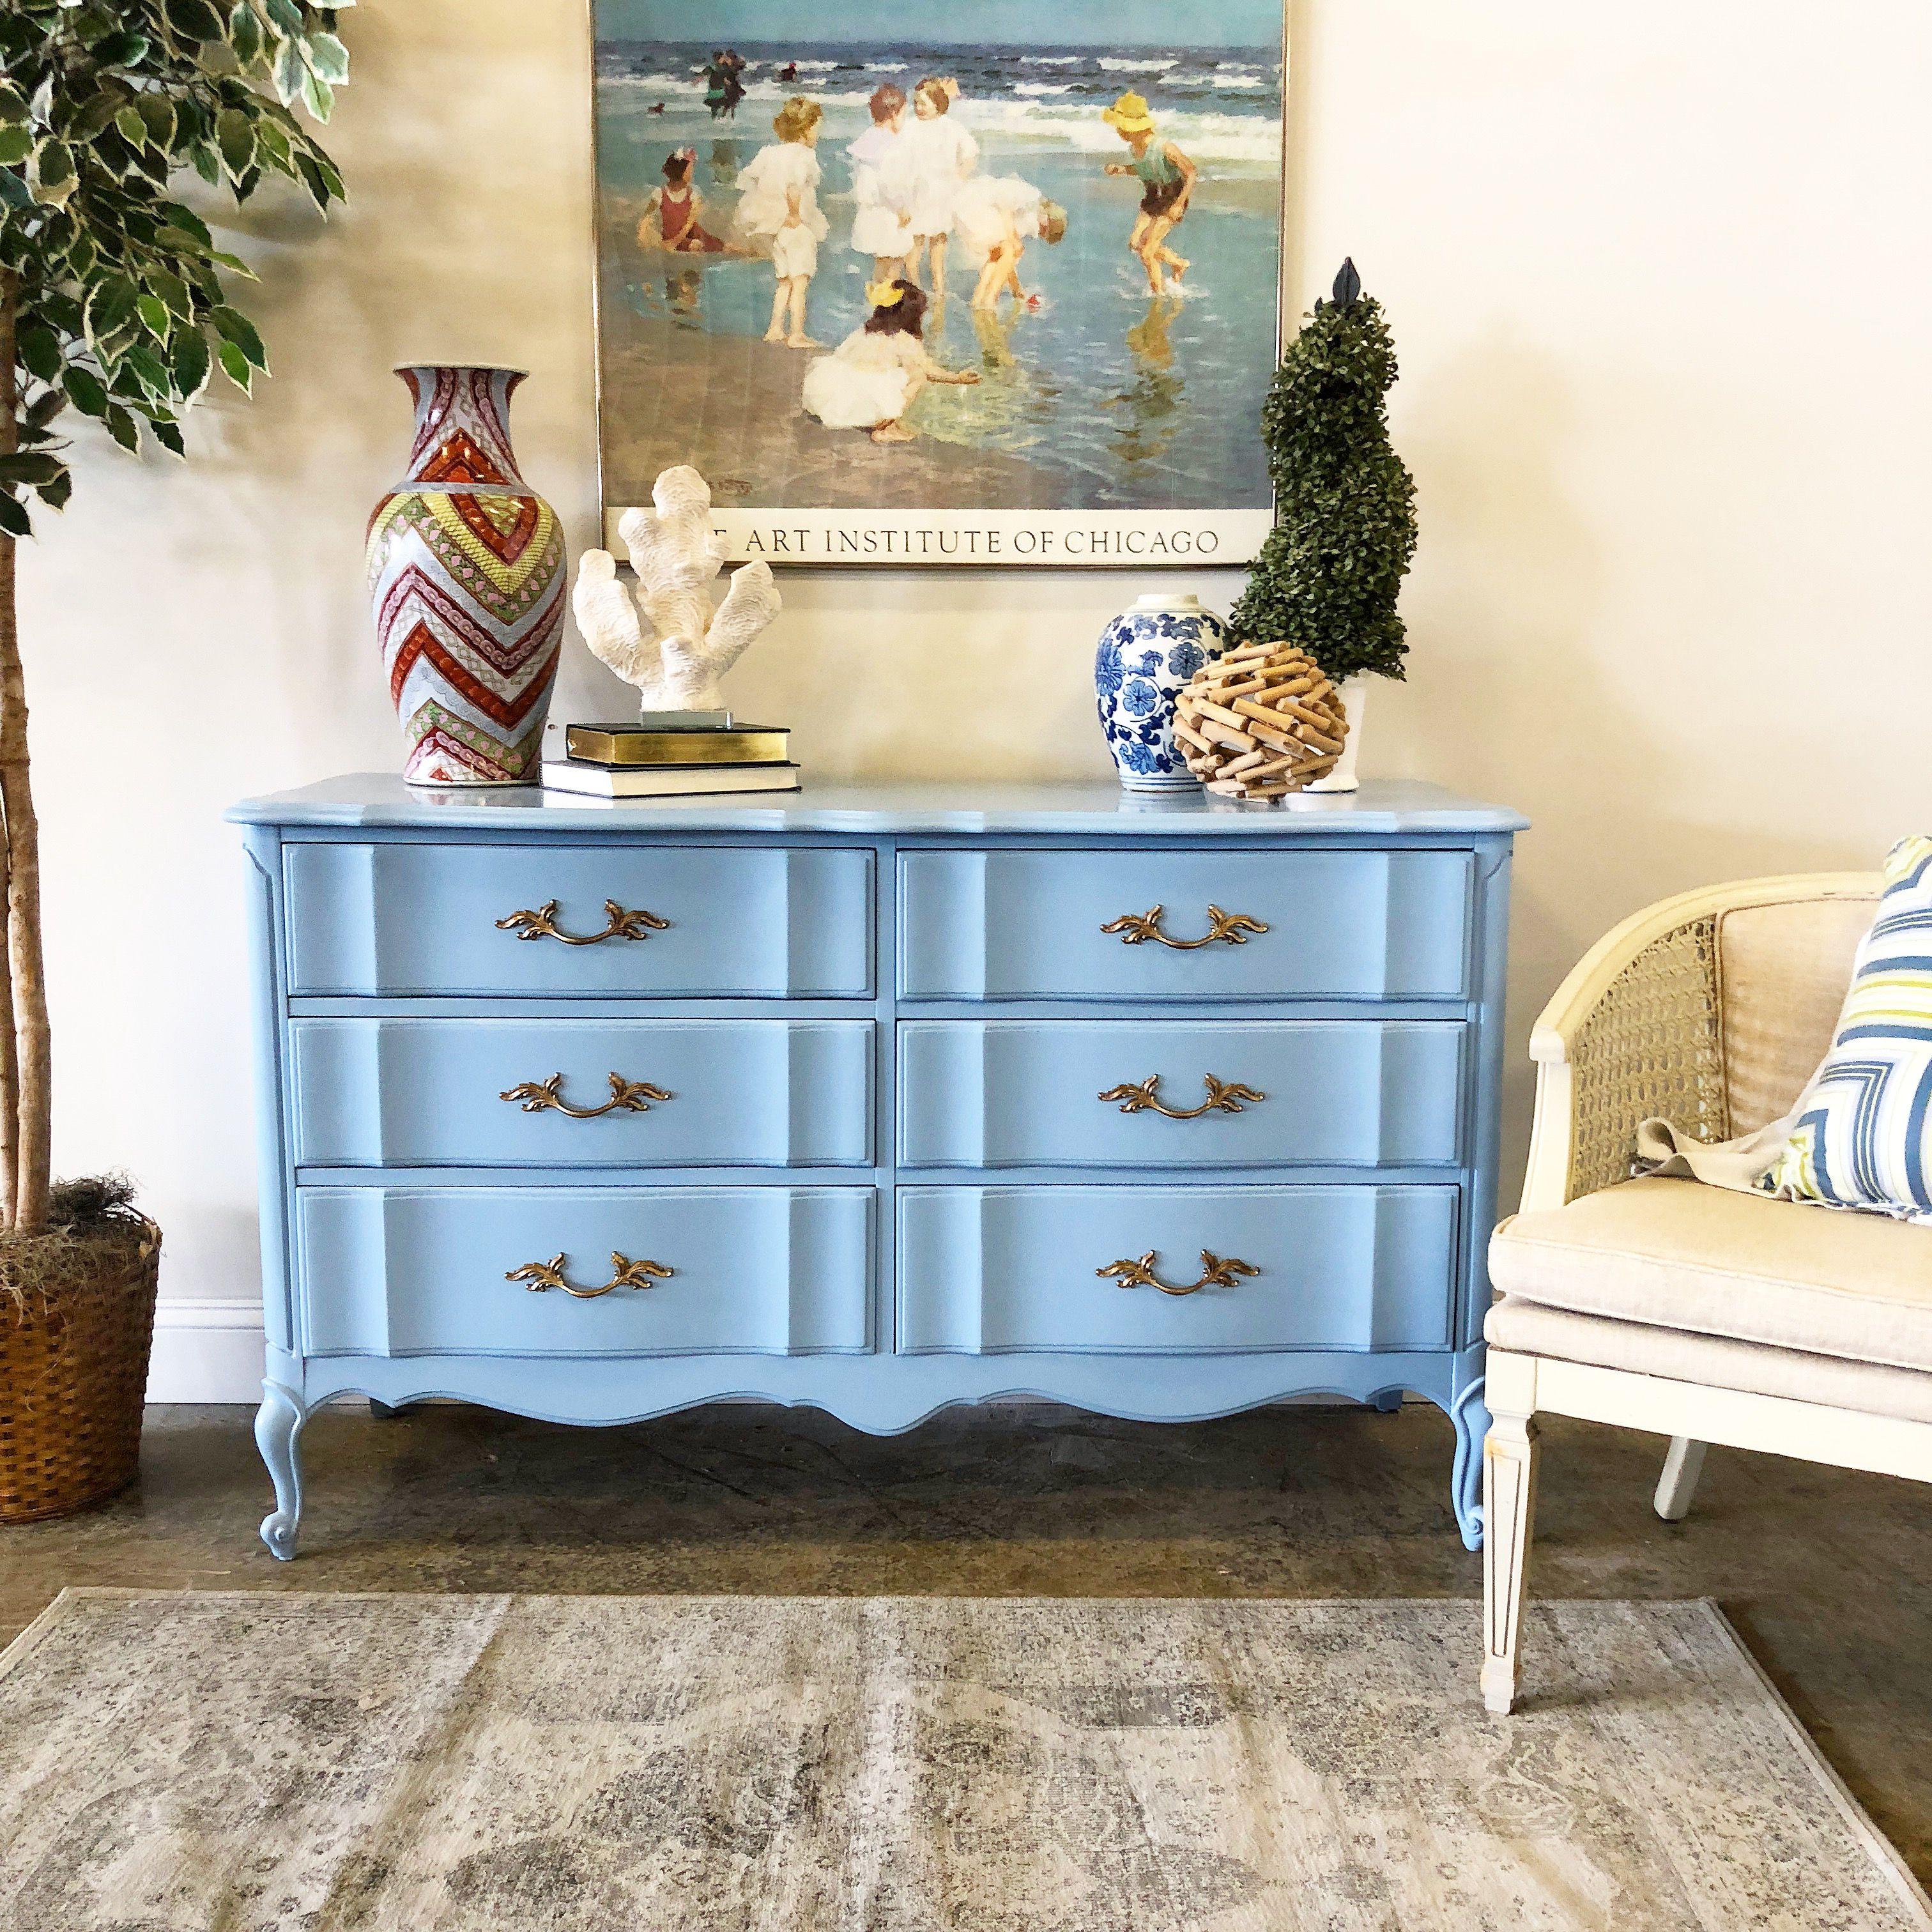 Light Blue Painted French Provincial Dresser Blue Painted Furniture Blue Bedroom Furniture Blue Painted Dresser [ 3024 x 3024 Pixel ]